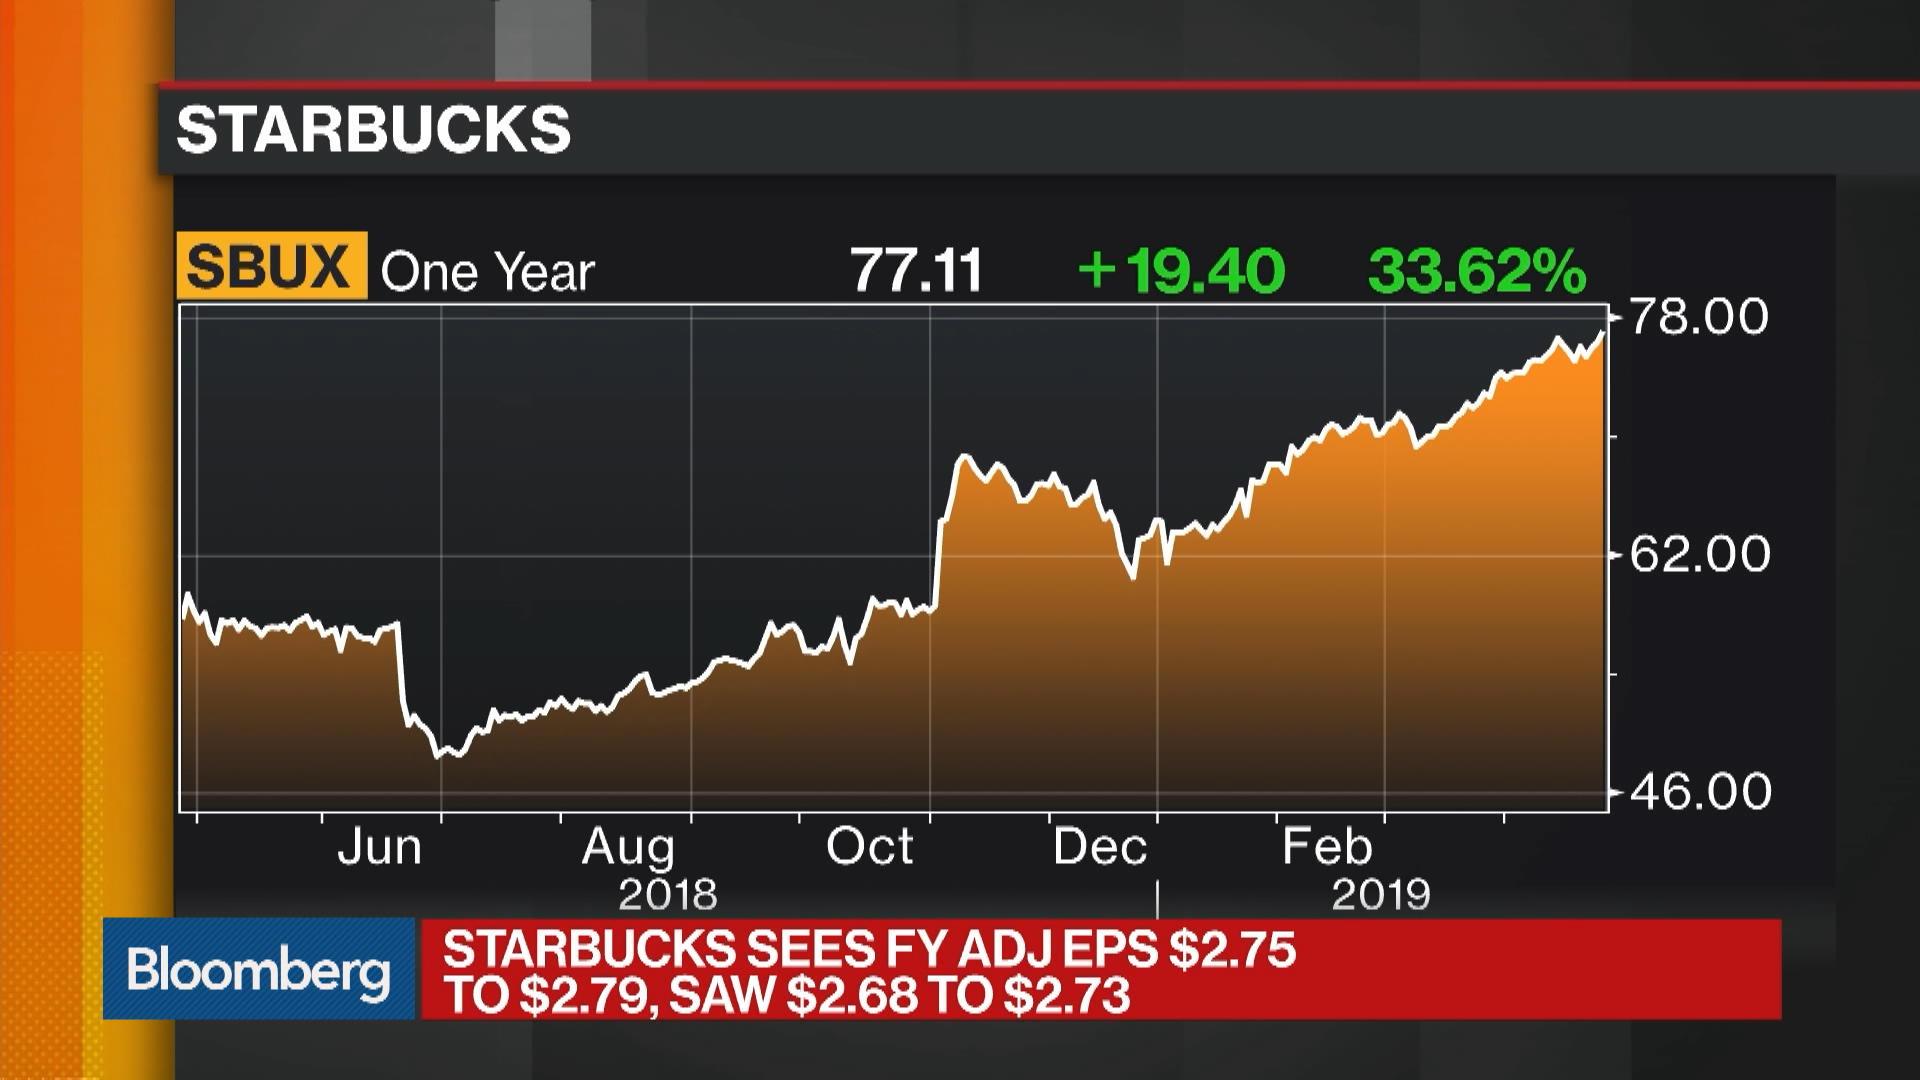 SBUX:NASDAQ GS Stock Quote - Starbucks Corp - Bloomberg Markets